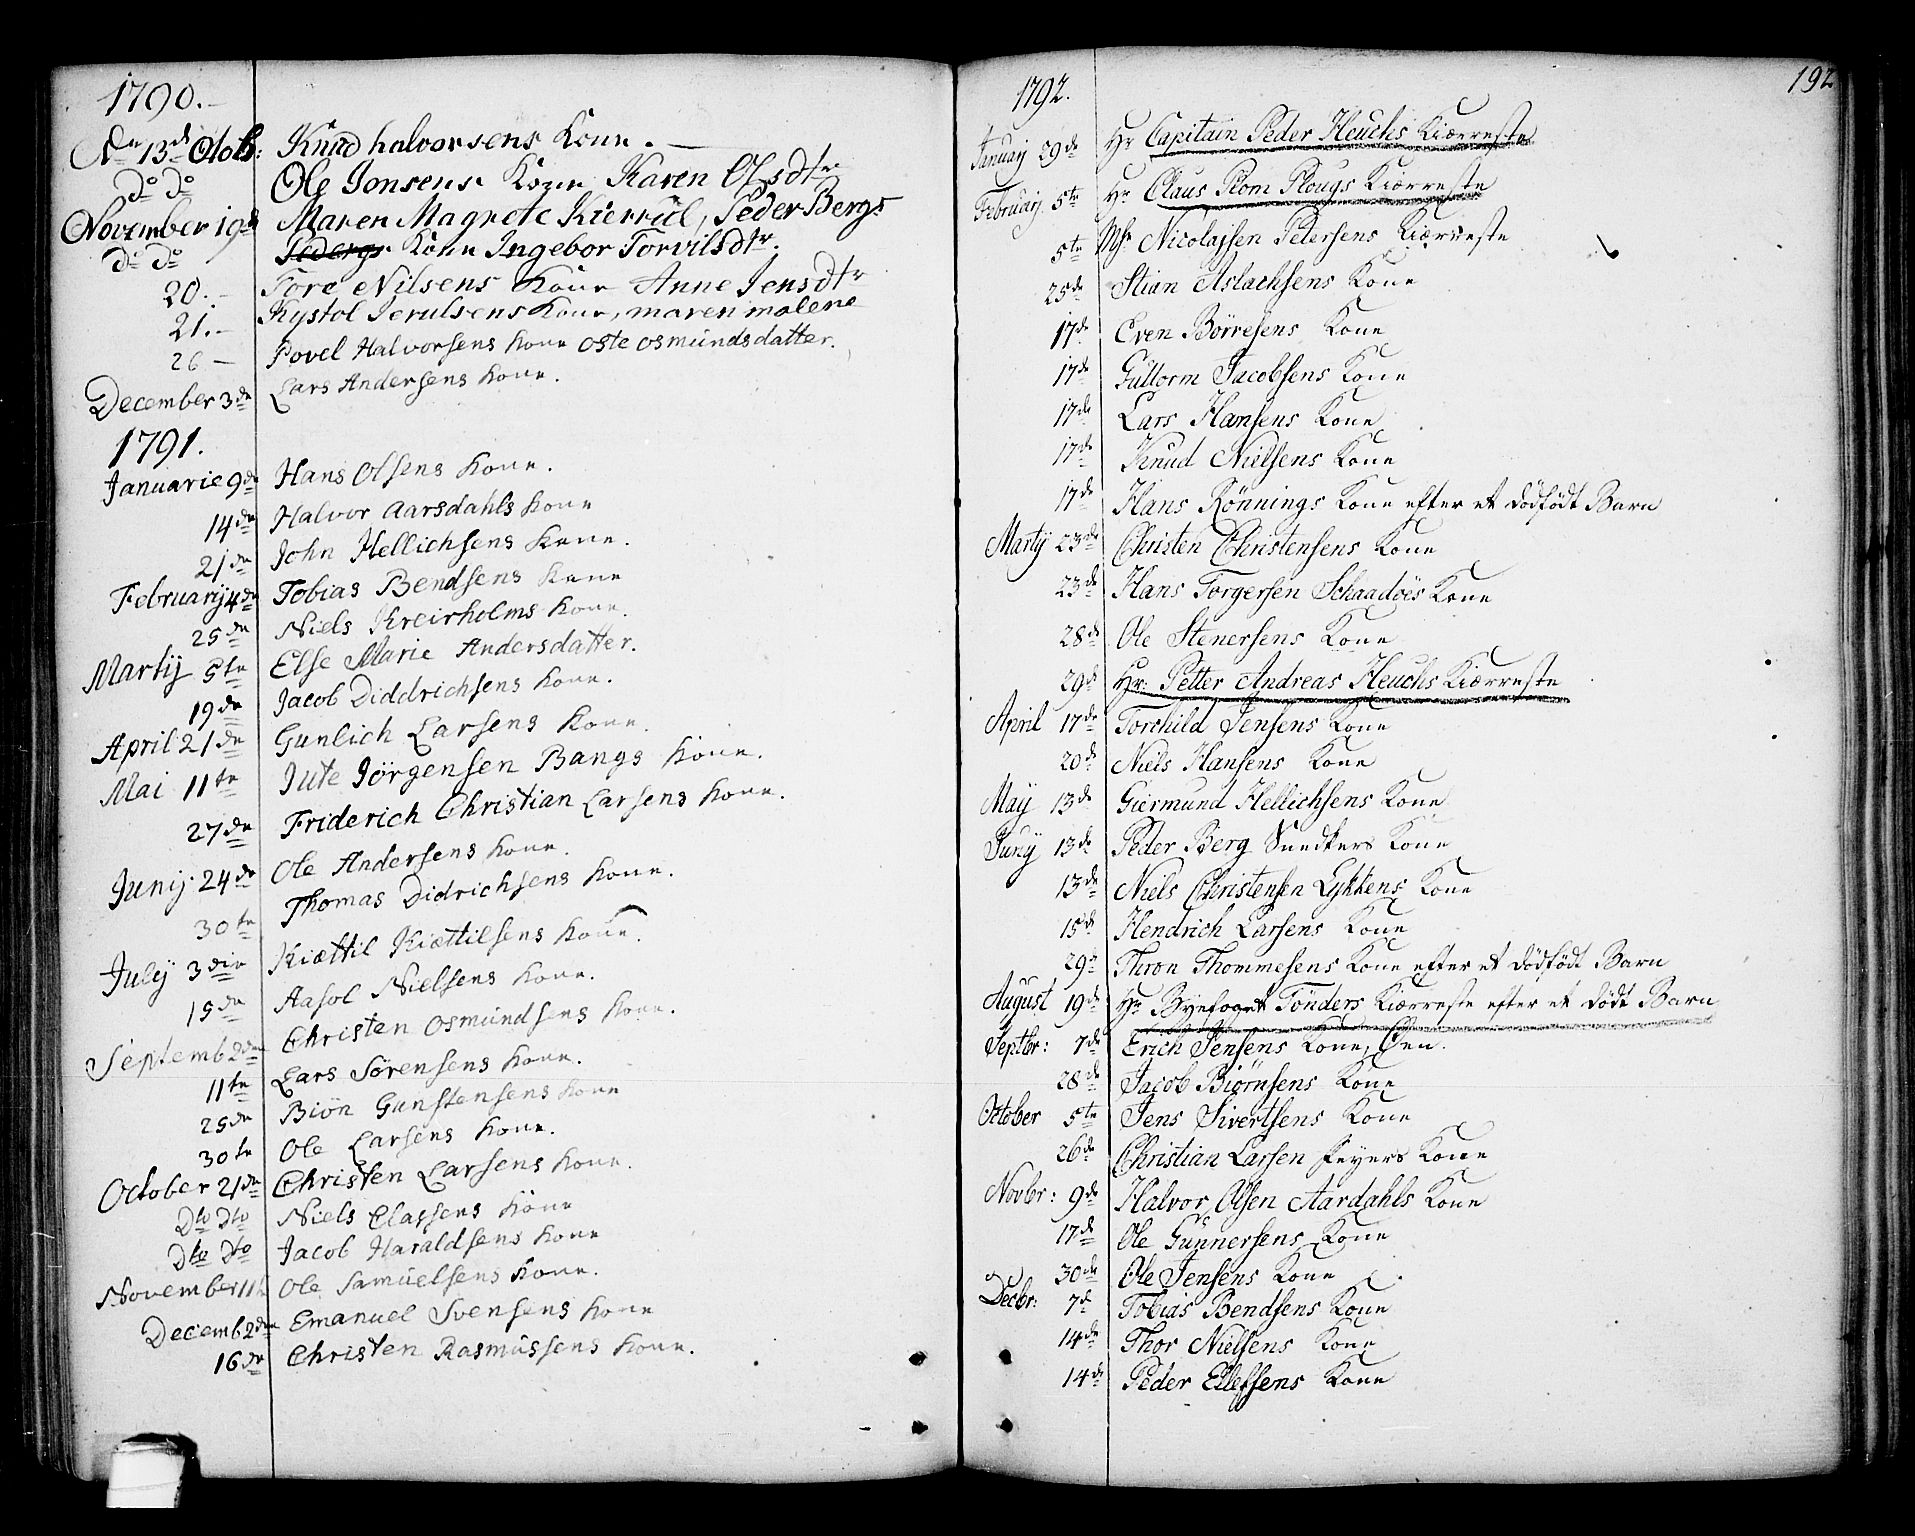 SAKO, Kragerø kirkebøker, F/Fa/L0002: Ministerialbok nr. 2, 1767-1802, s. 192